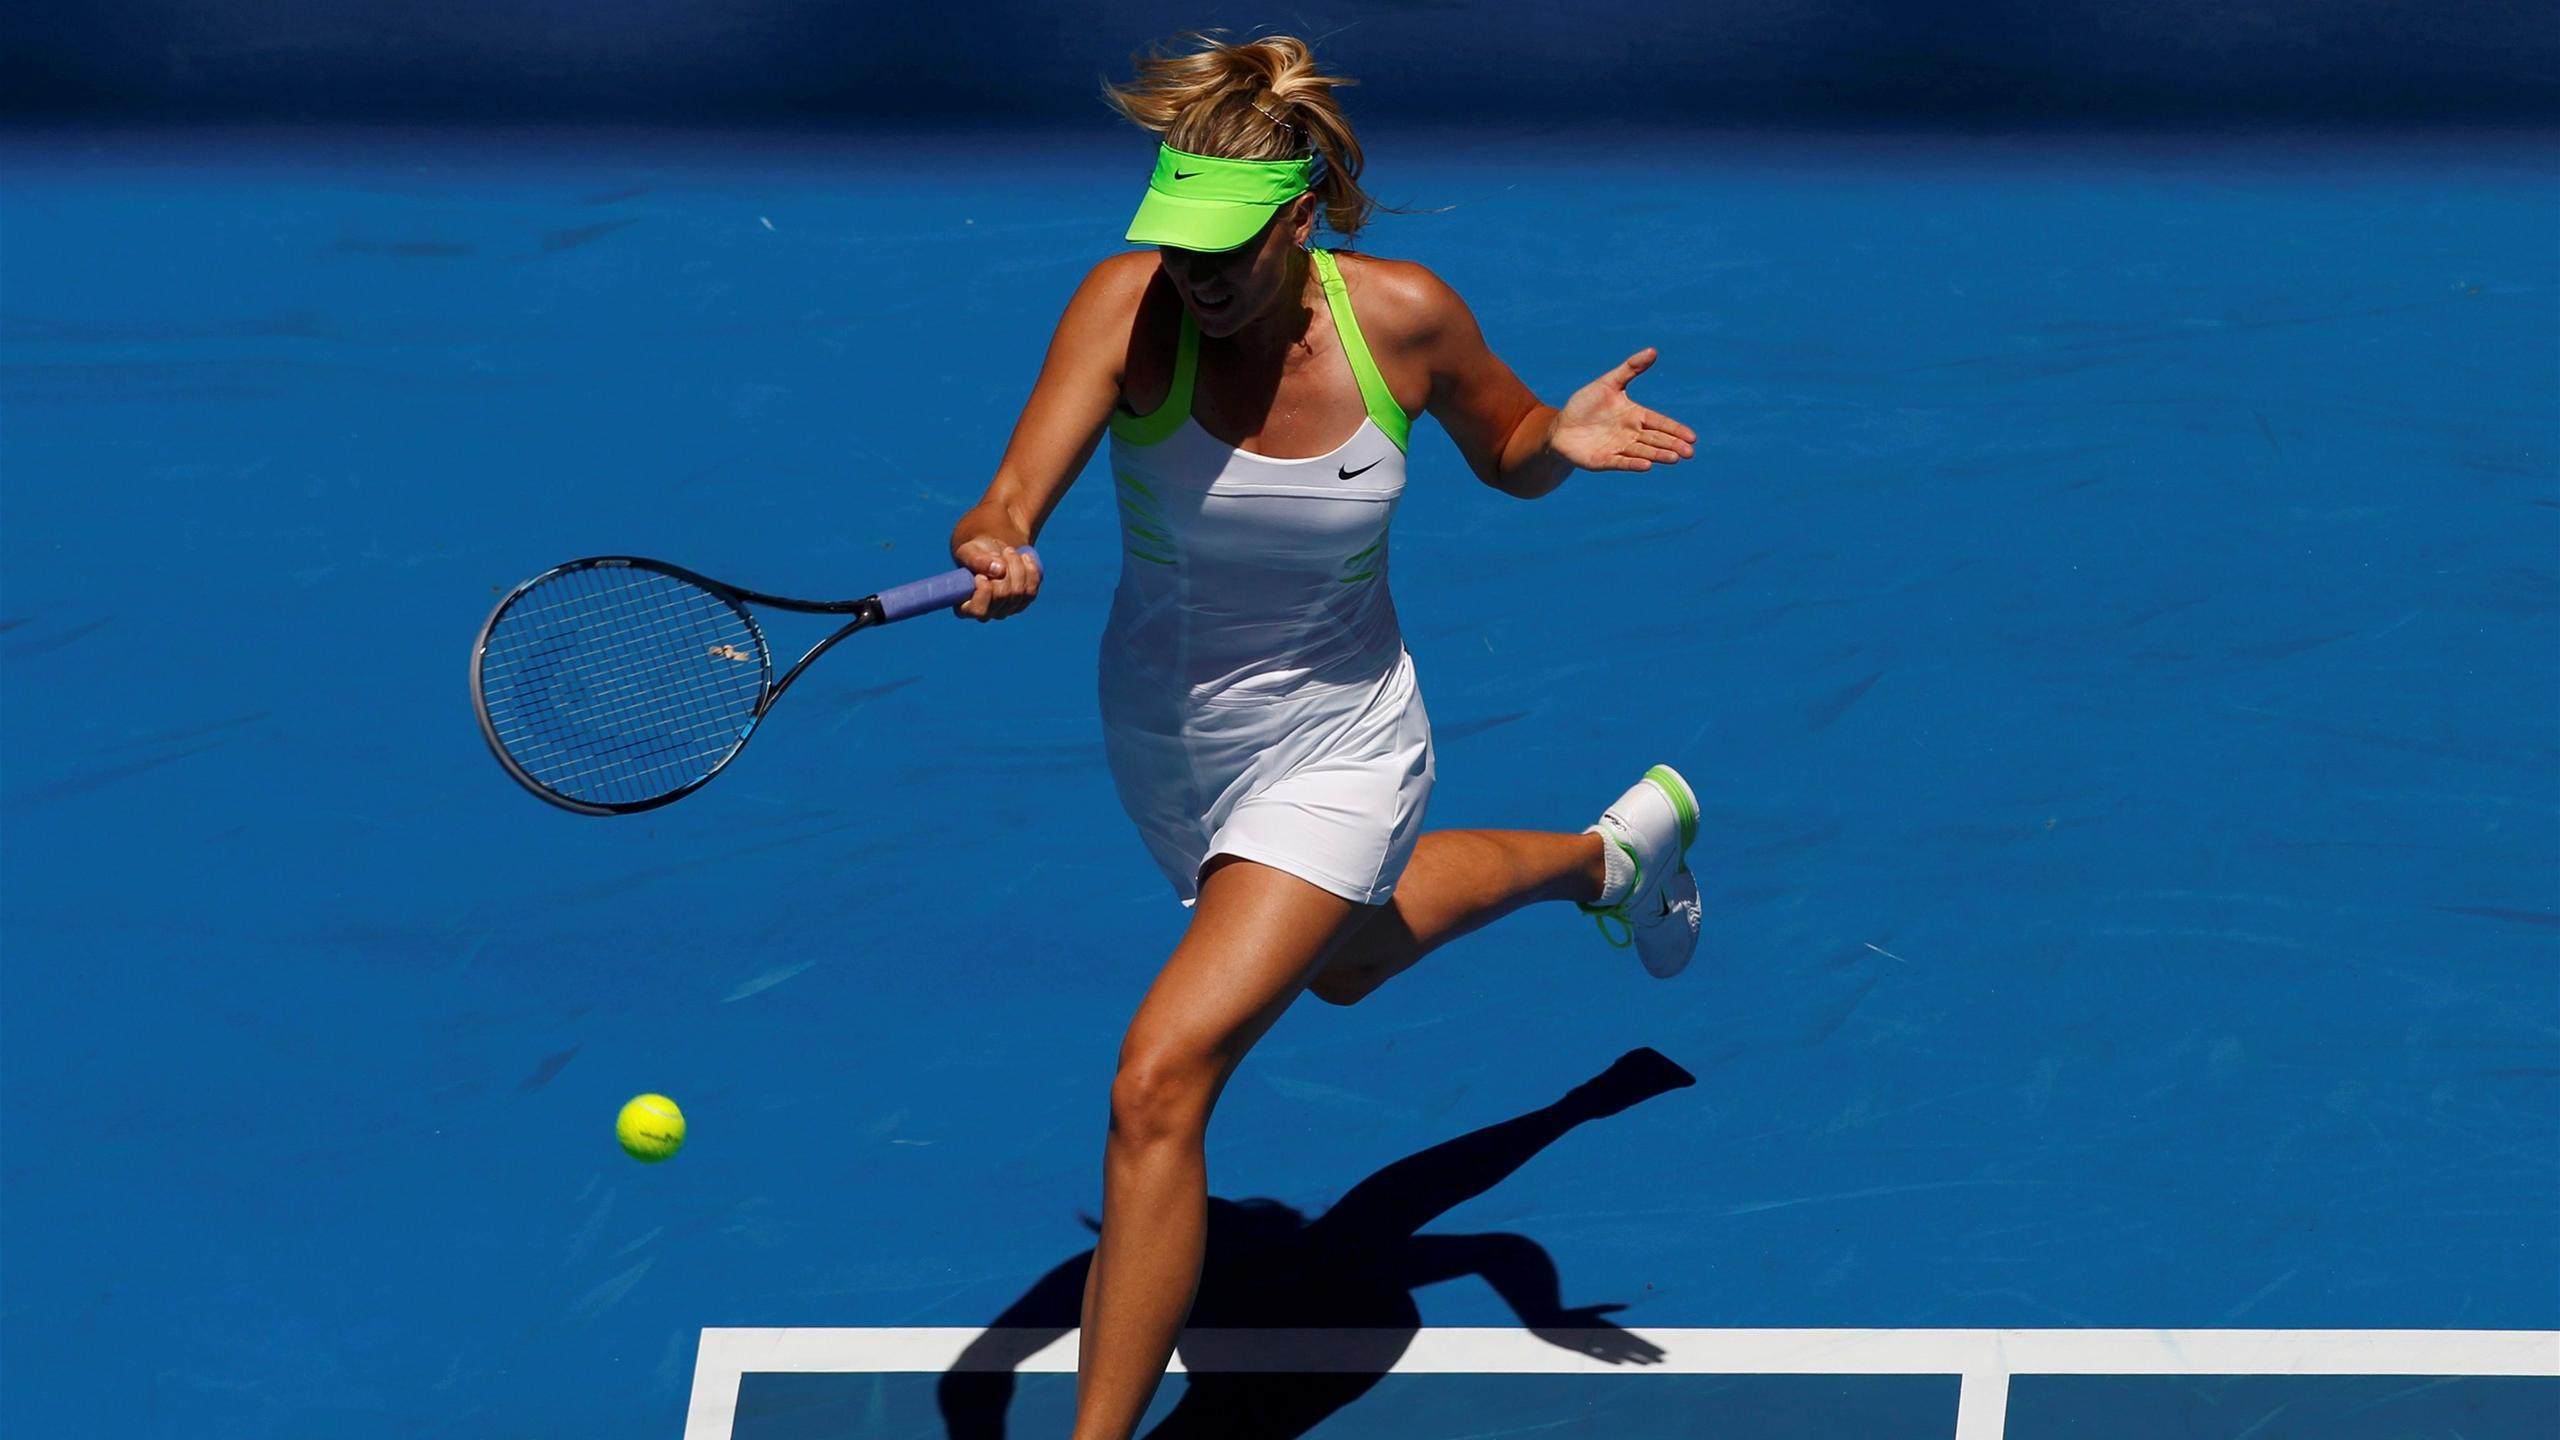 Русская теннисистка мария васнецова фото